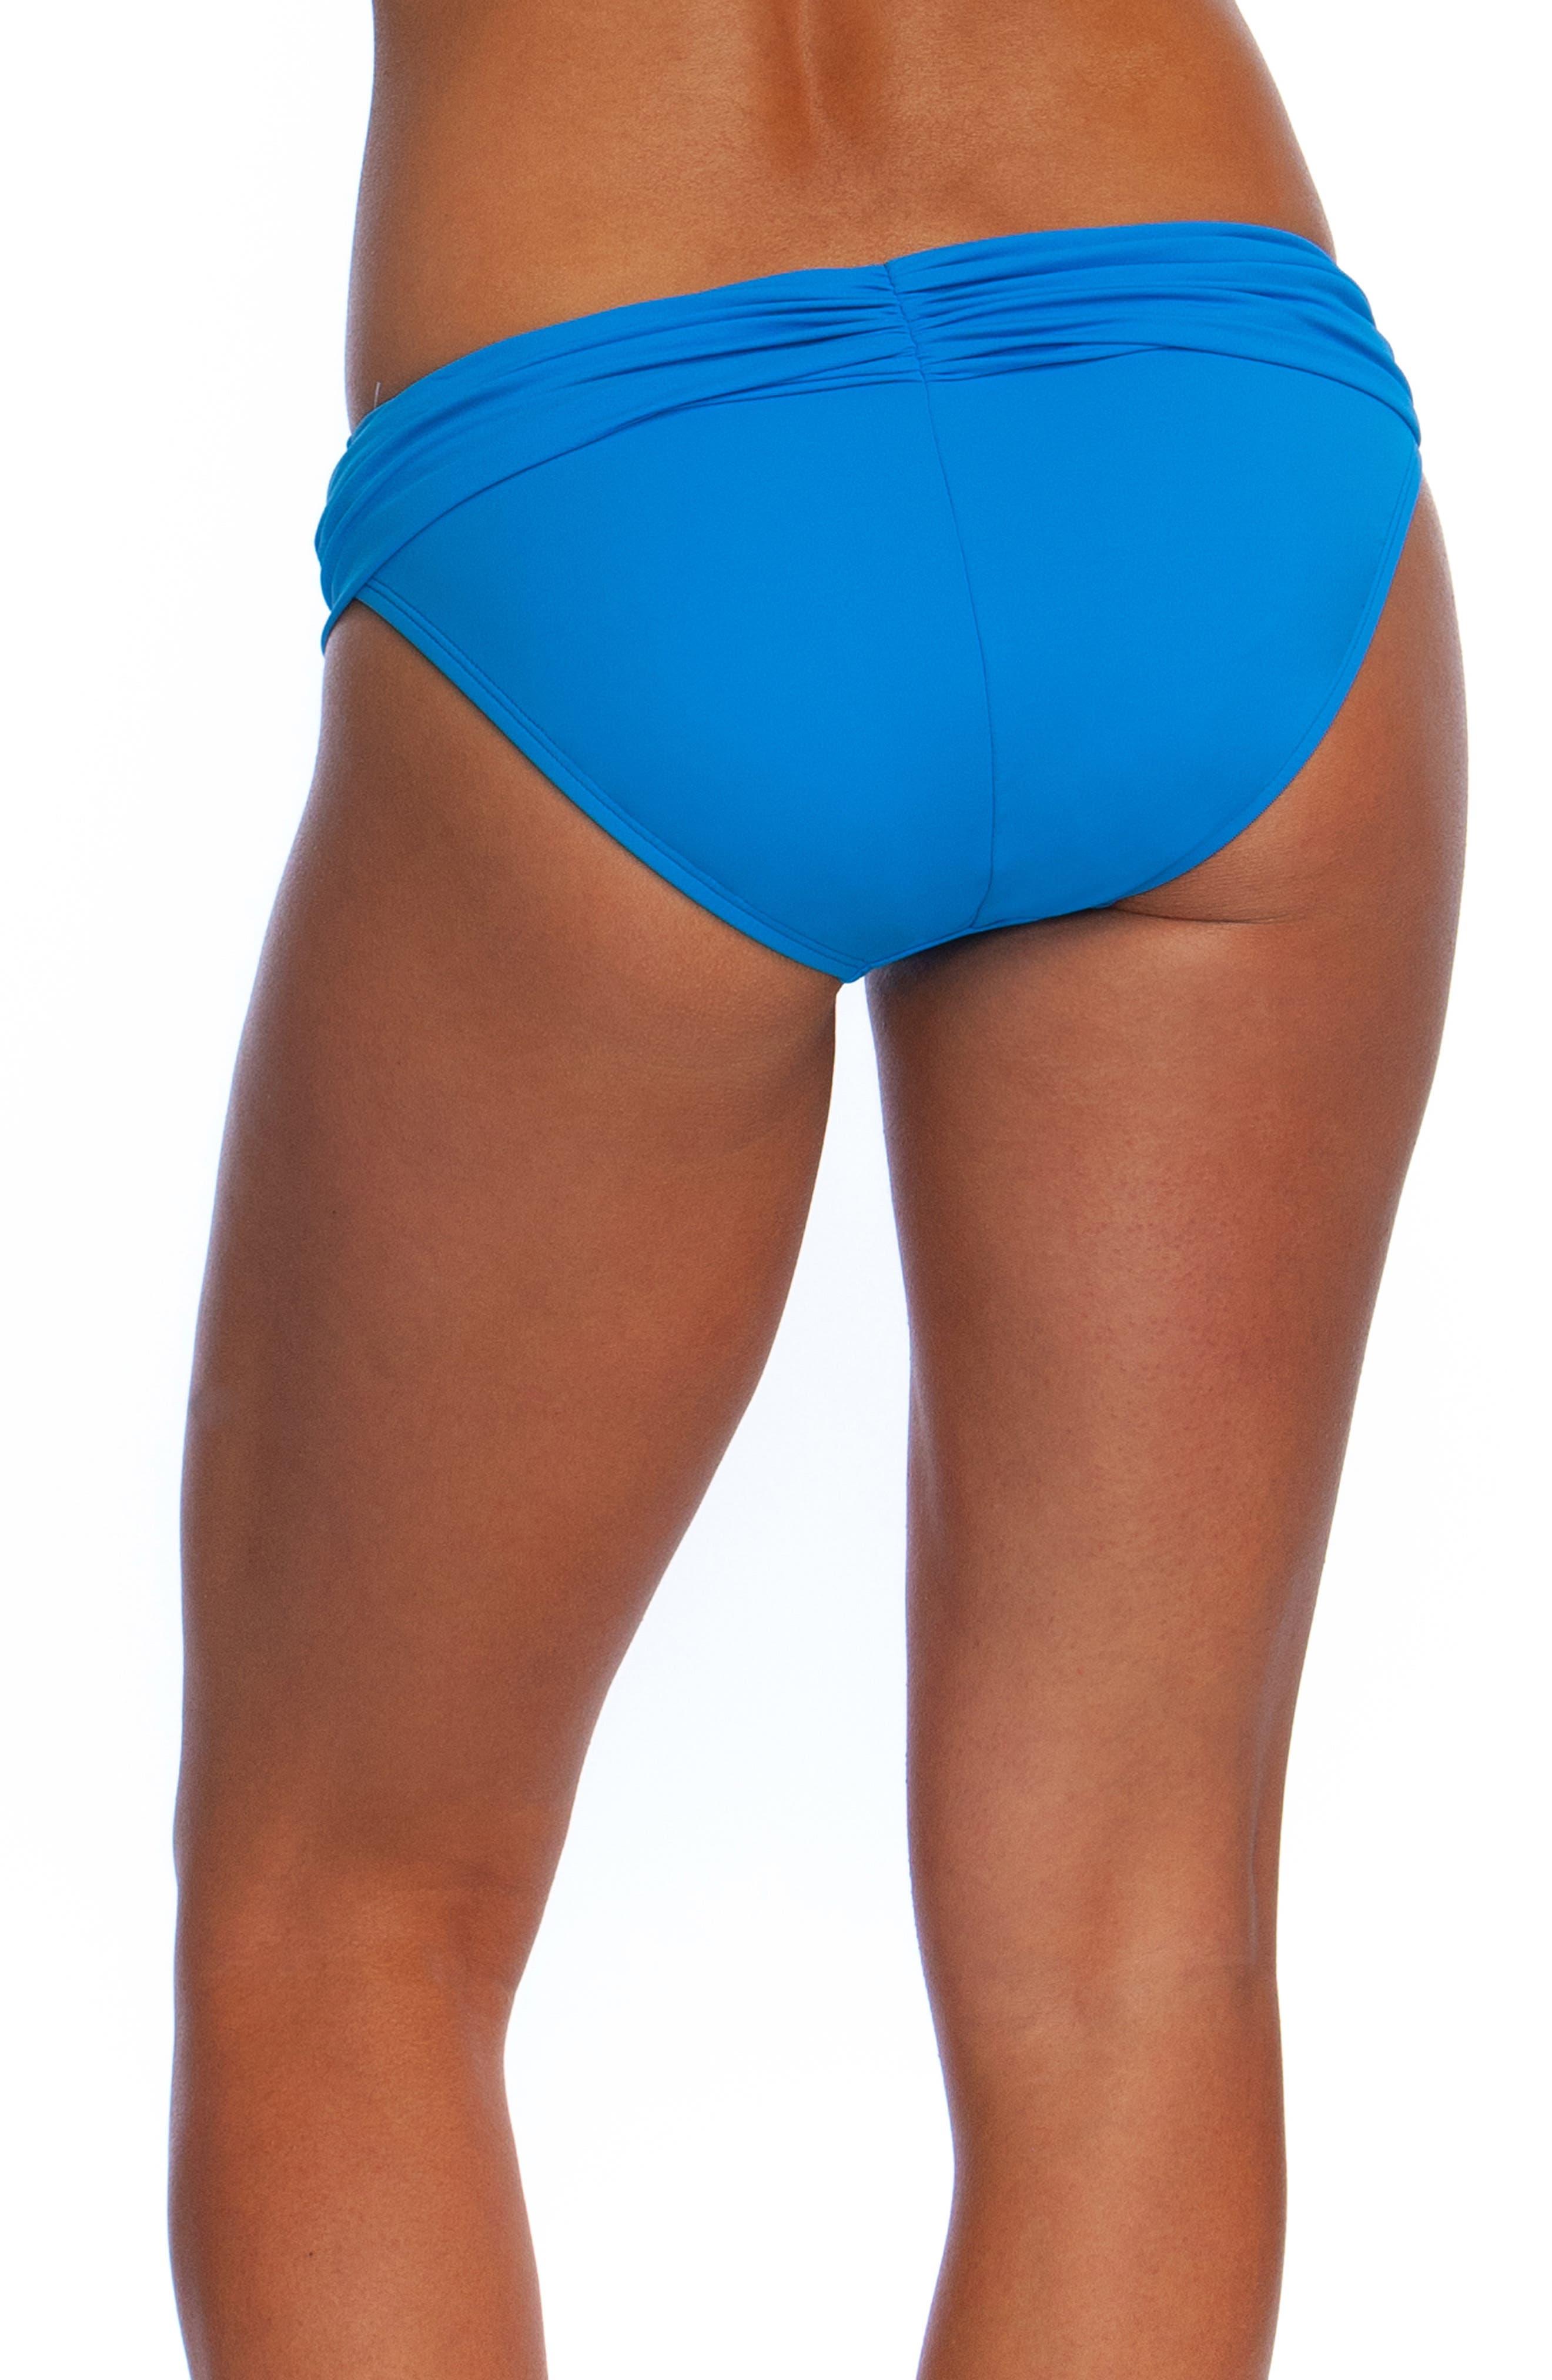 fcc5d369fbfc3 Women's Bikinis, Two-Piece Swimsuits | Nordstrom